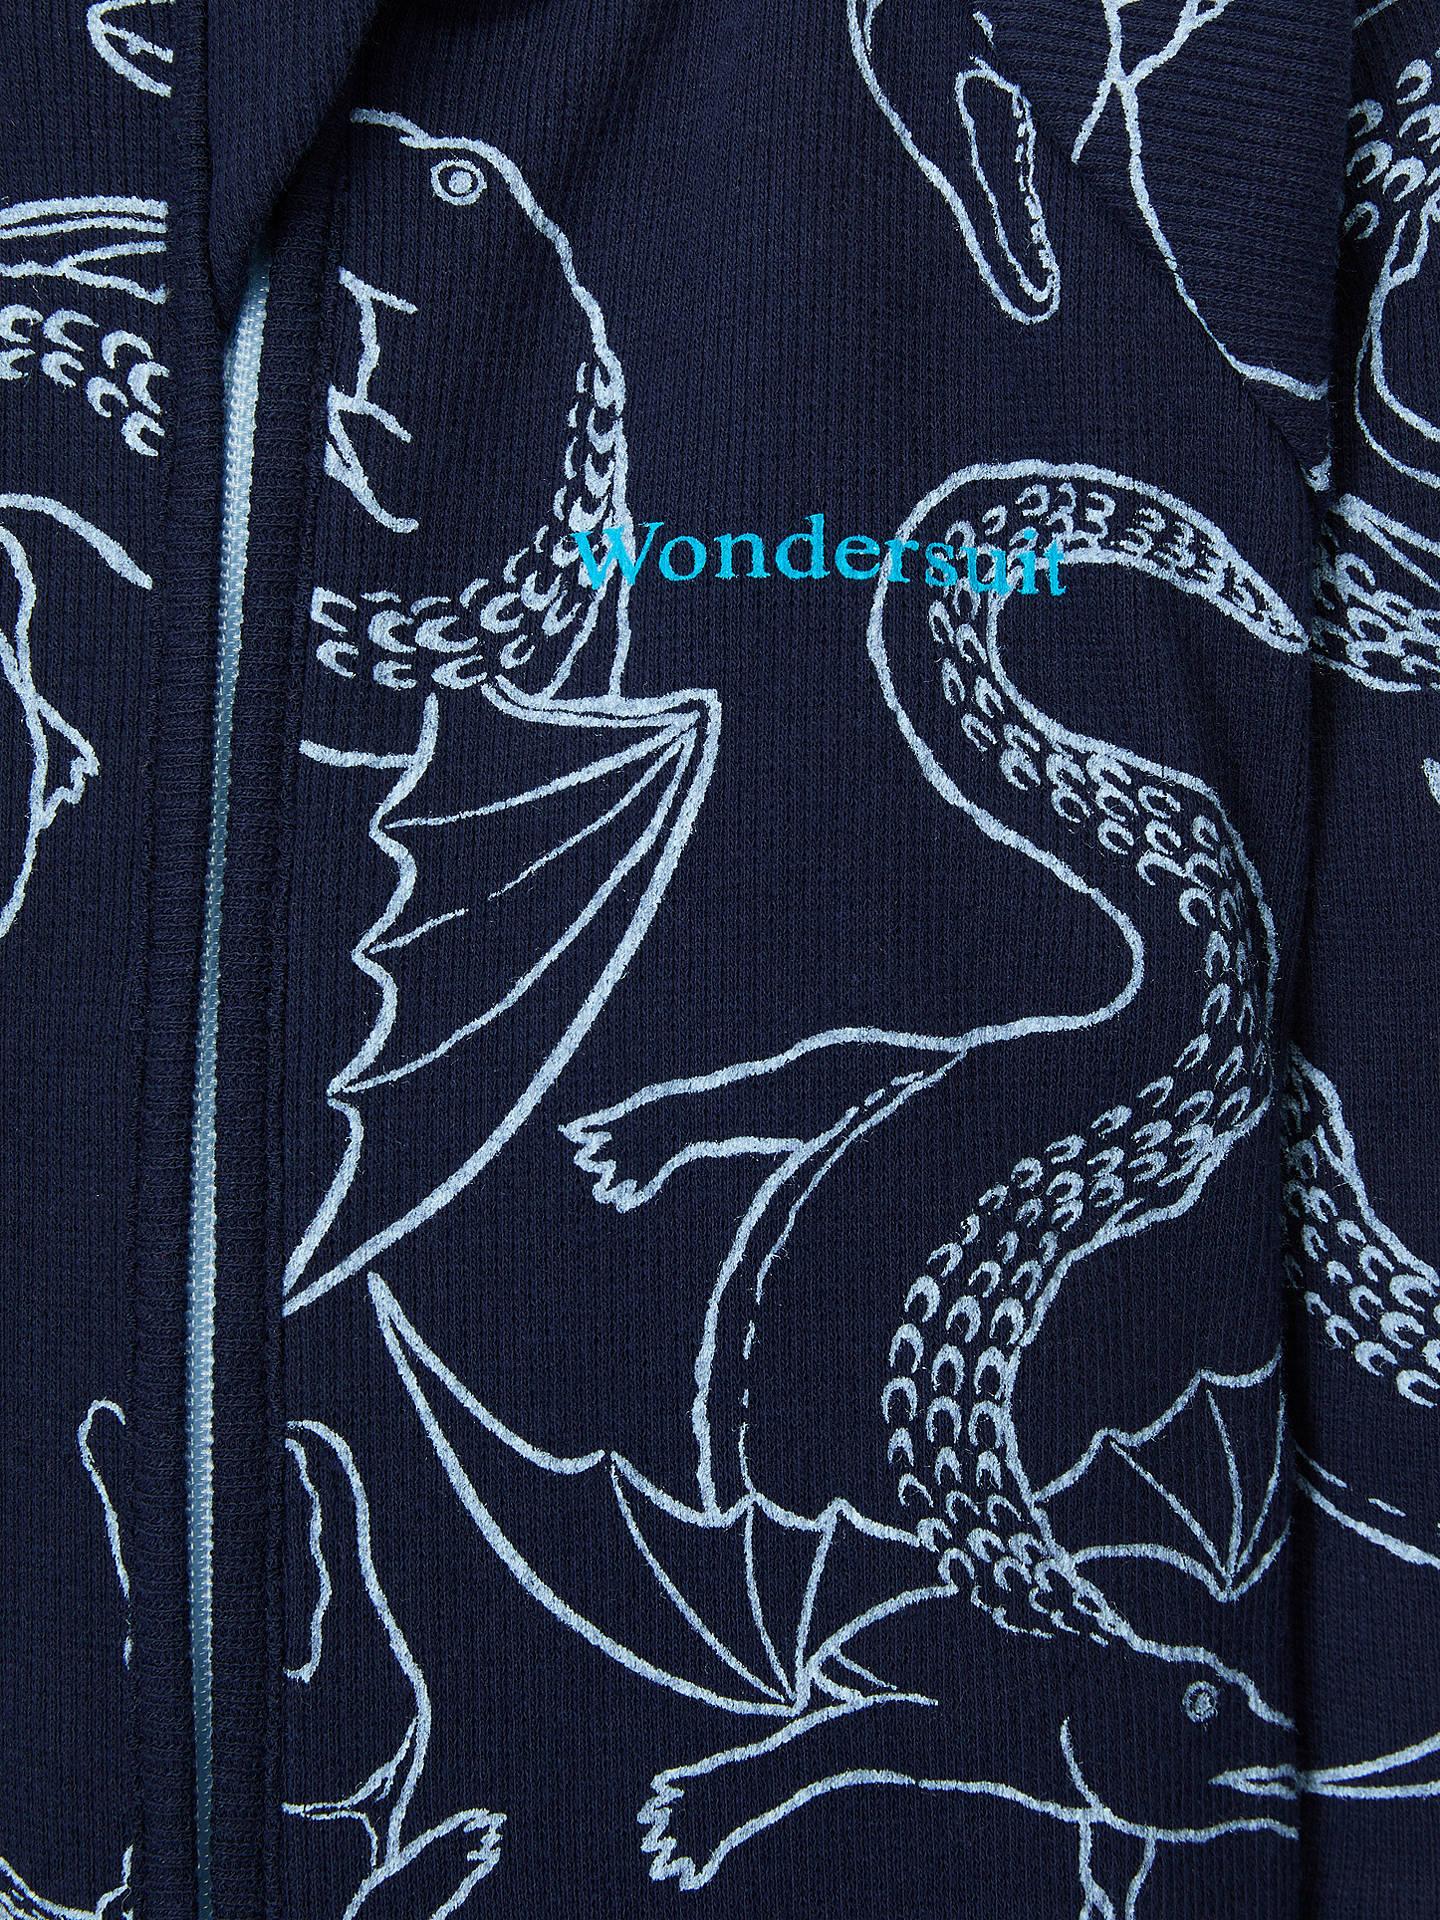 a3b54b382b3f ... Buy Bonds Baby Crocodile Dragon Outline Wondersuit, Blue, 0-3 months  Online at